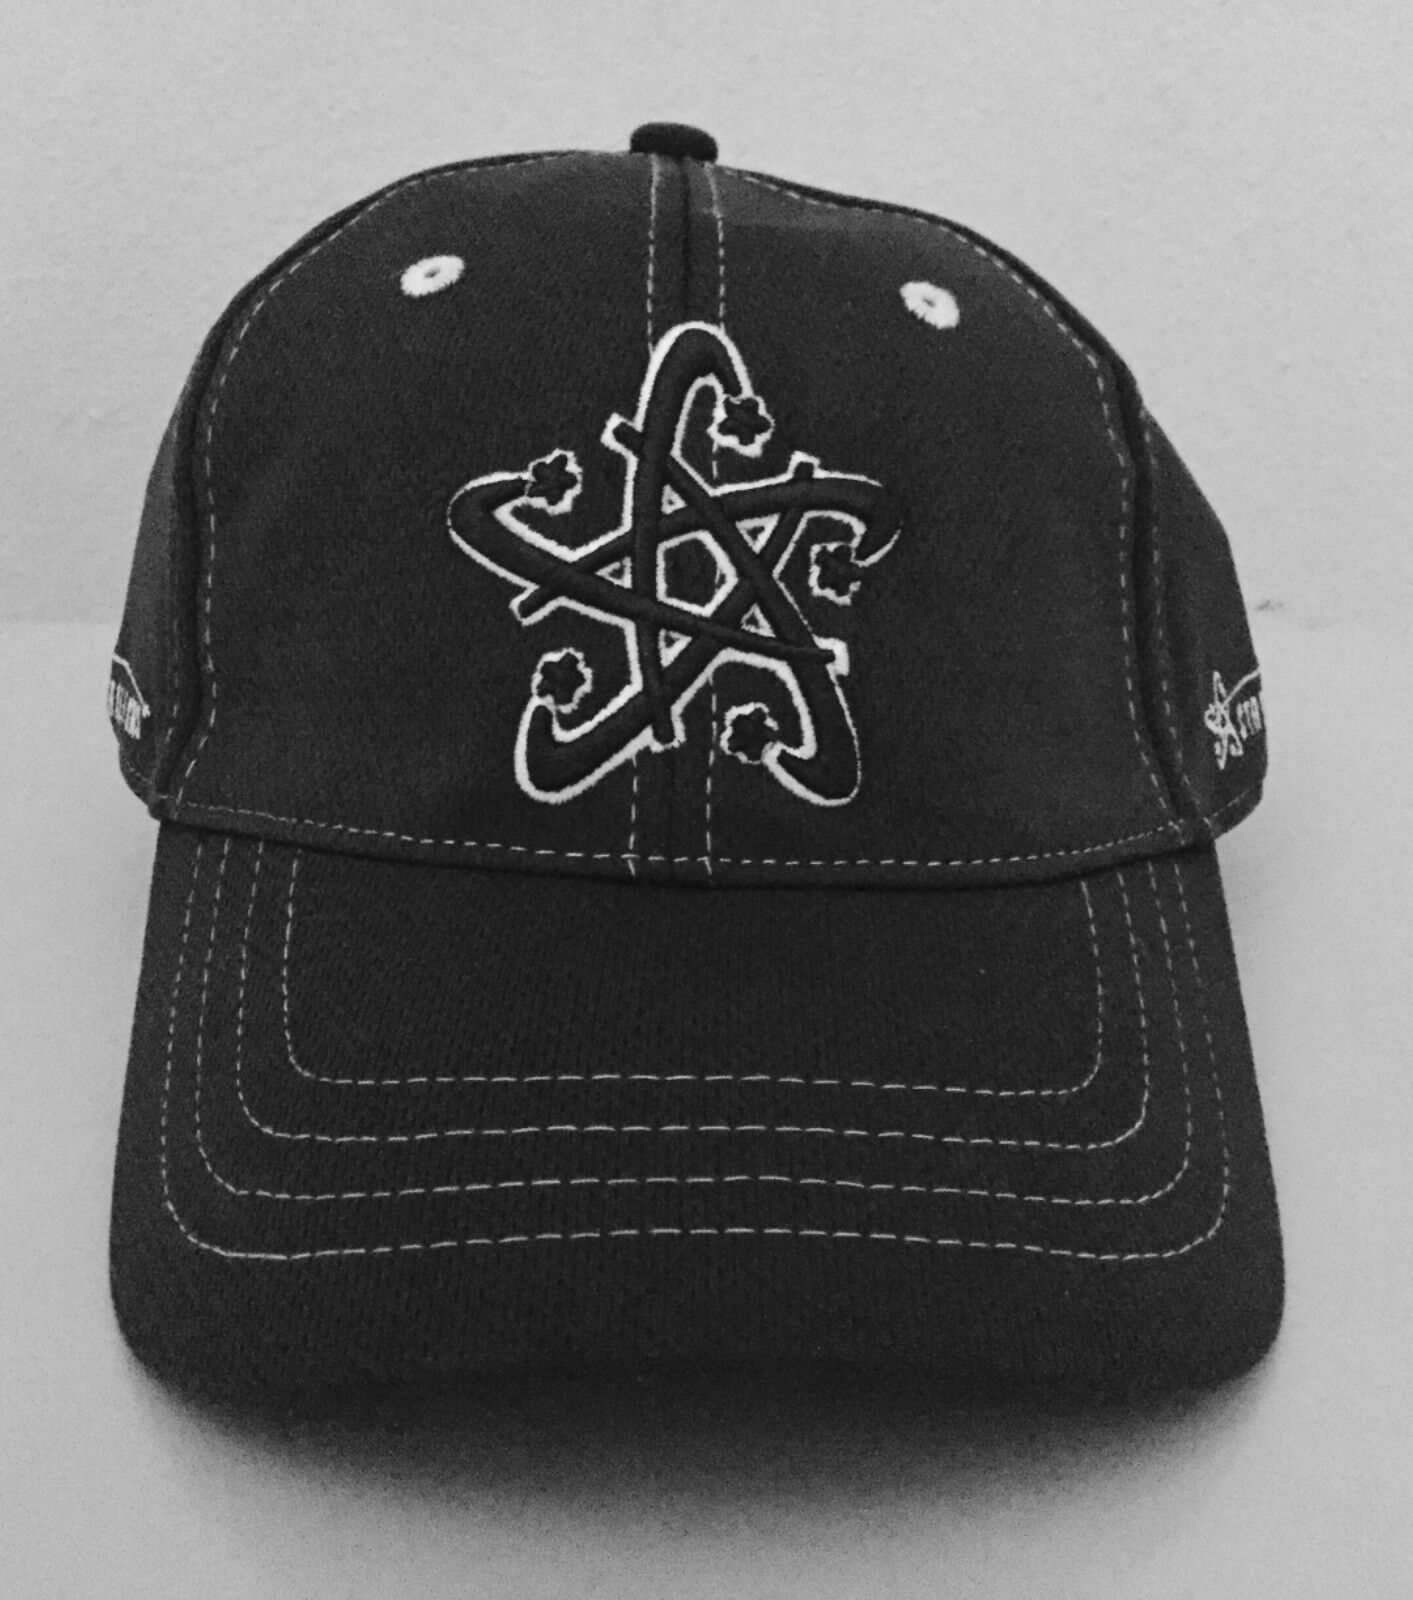 8c9222f71cc New star companies men embroidery strapback hat cap charcoal gray strapback  embroidery cap osfm jpg 1413x1600